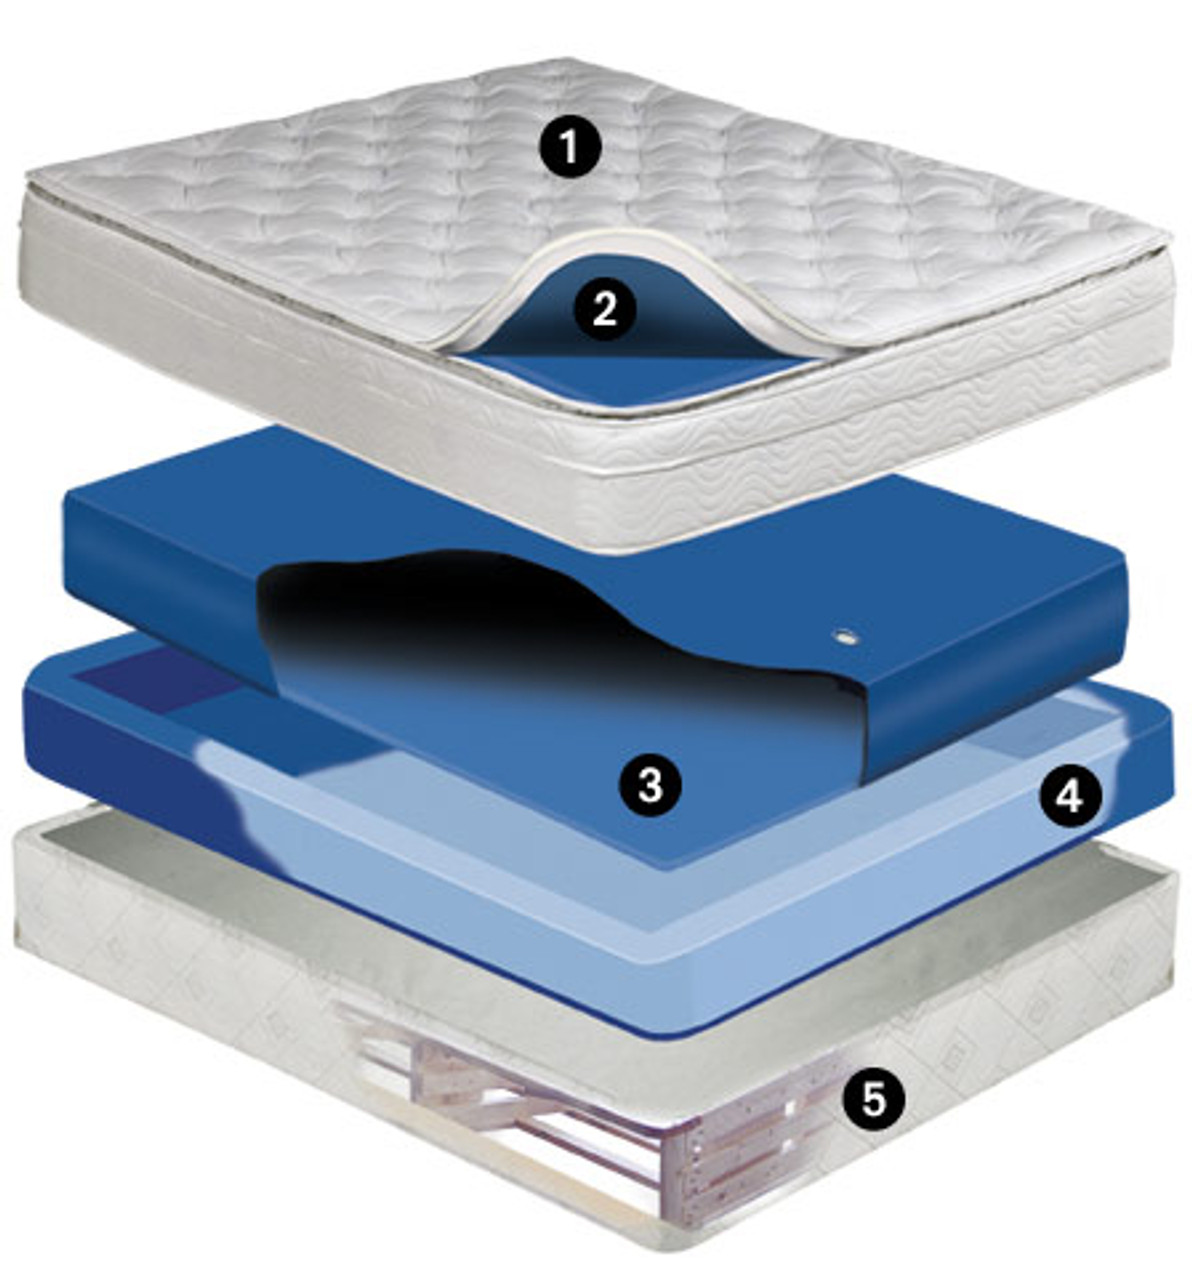 Meridian 10 inch deep fill softside waterbed mattress Free Flow